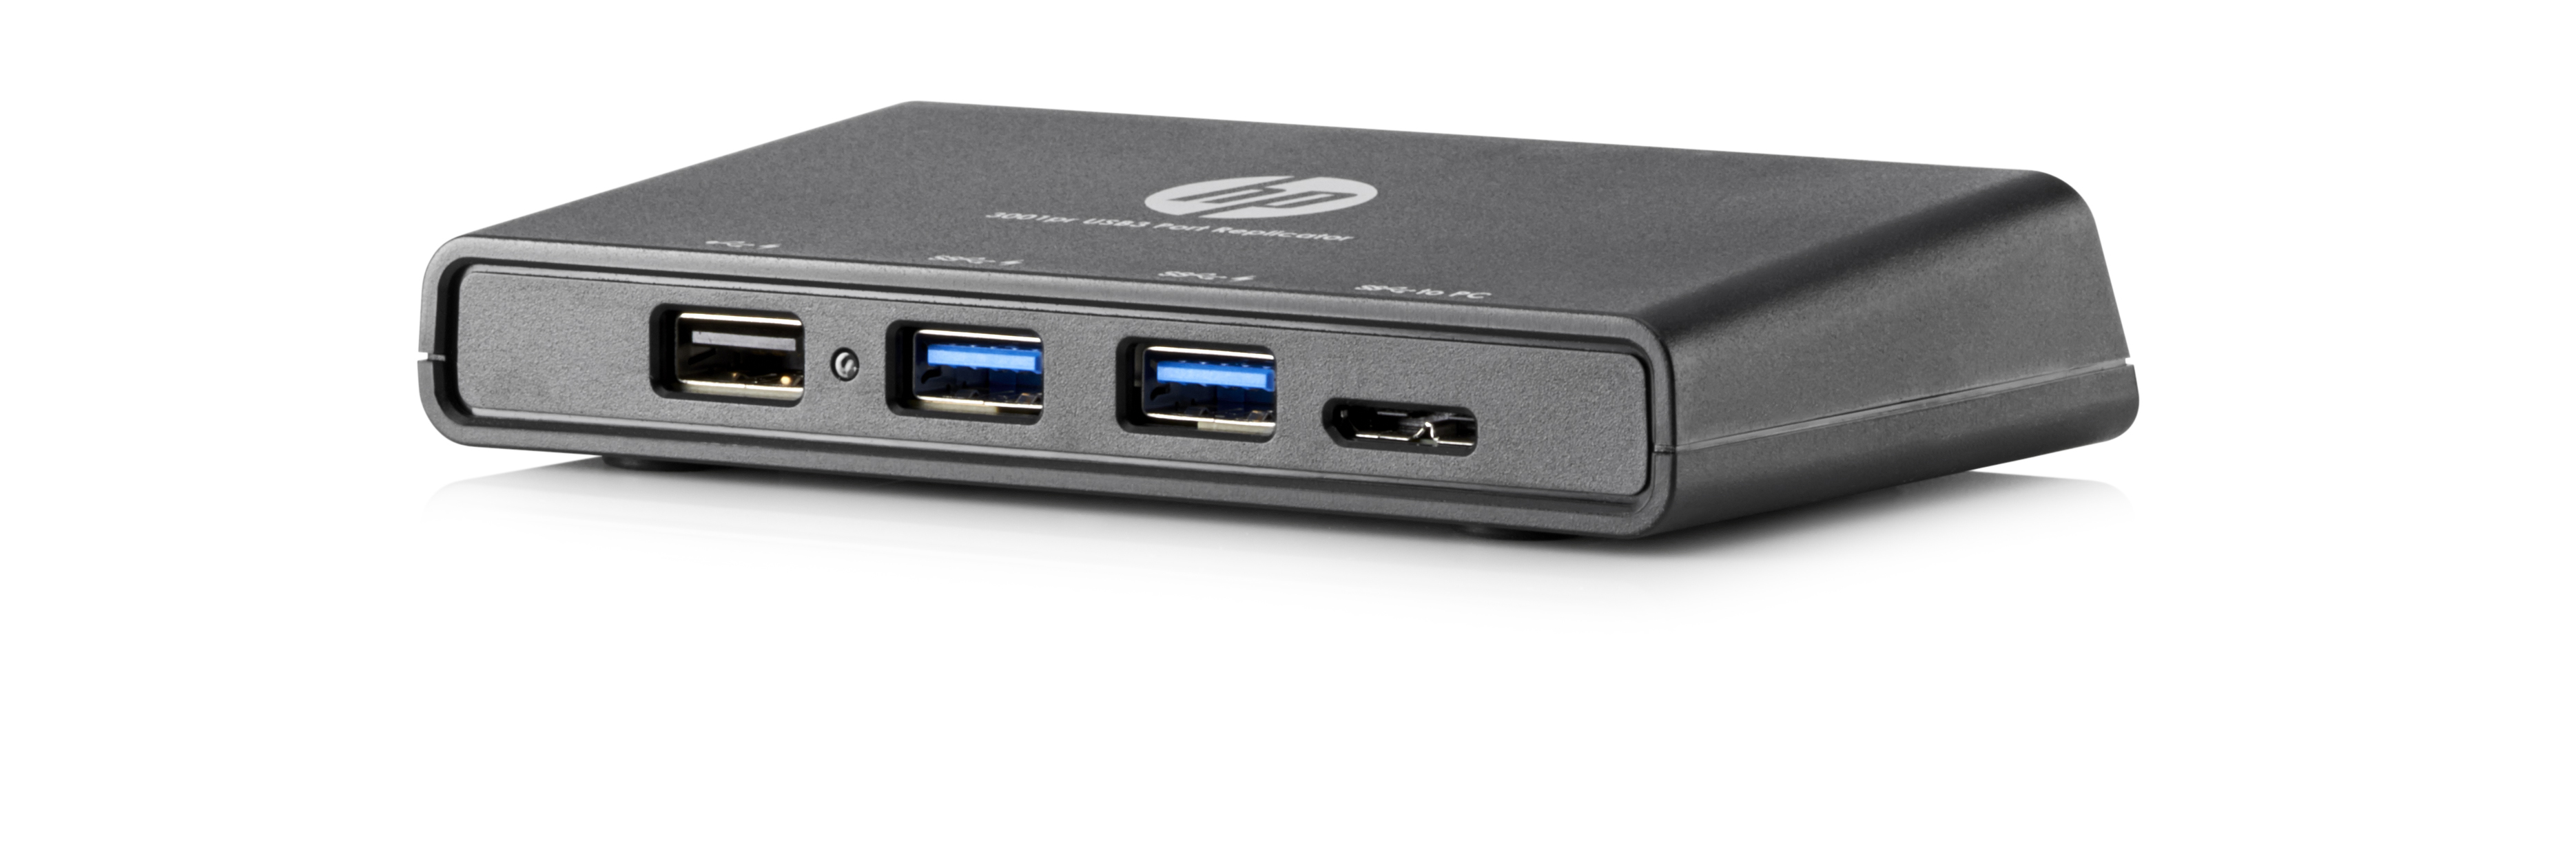 HP 3001pr USB 3.0 Port Replicator USB 3.0 (3.1 Gen 1) Type-A Schwarz